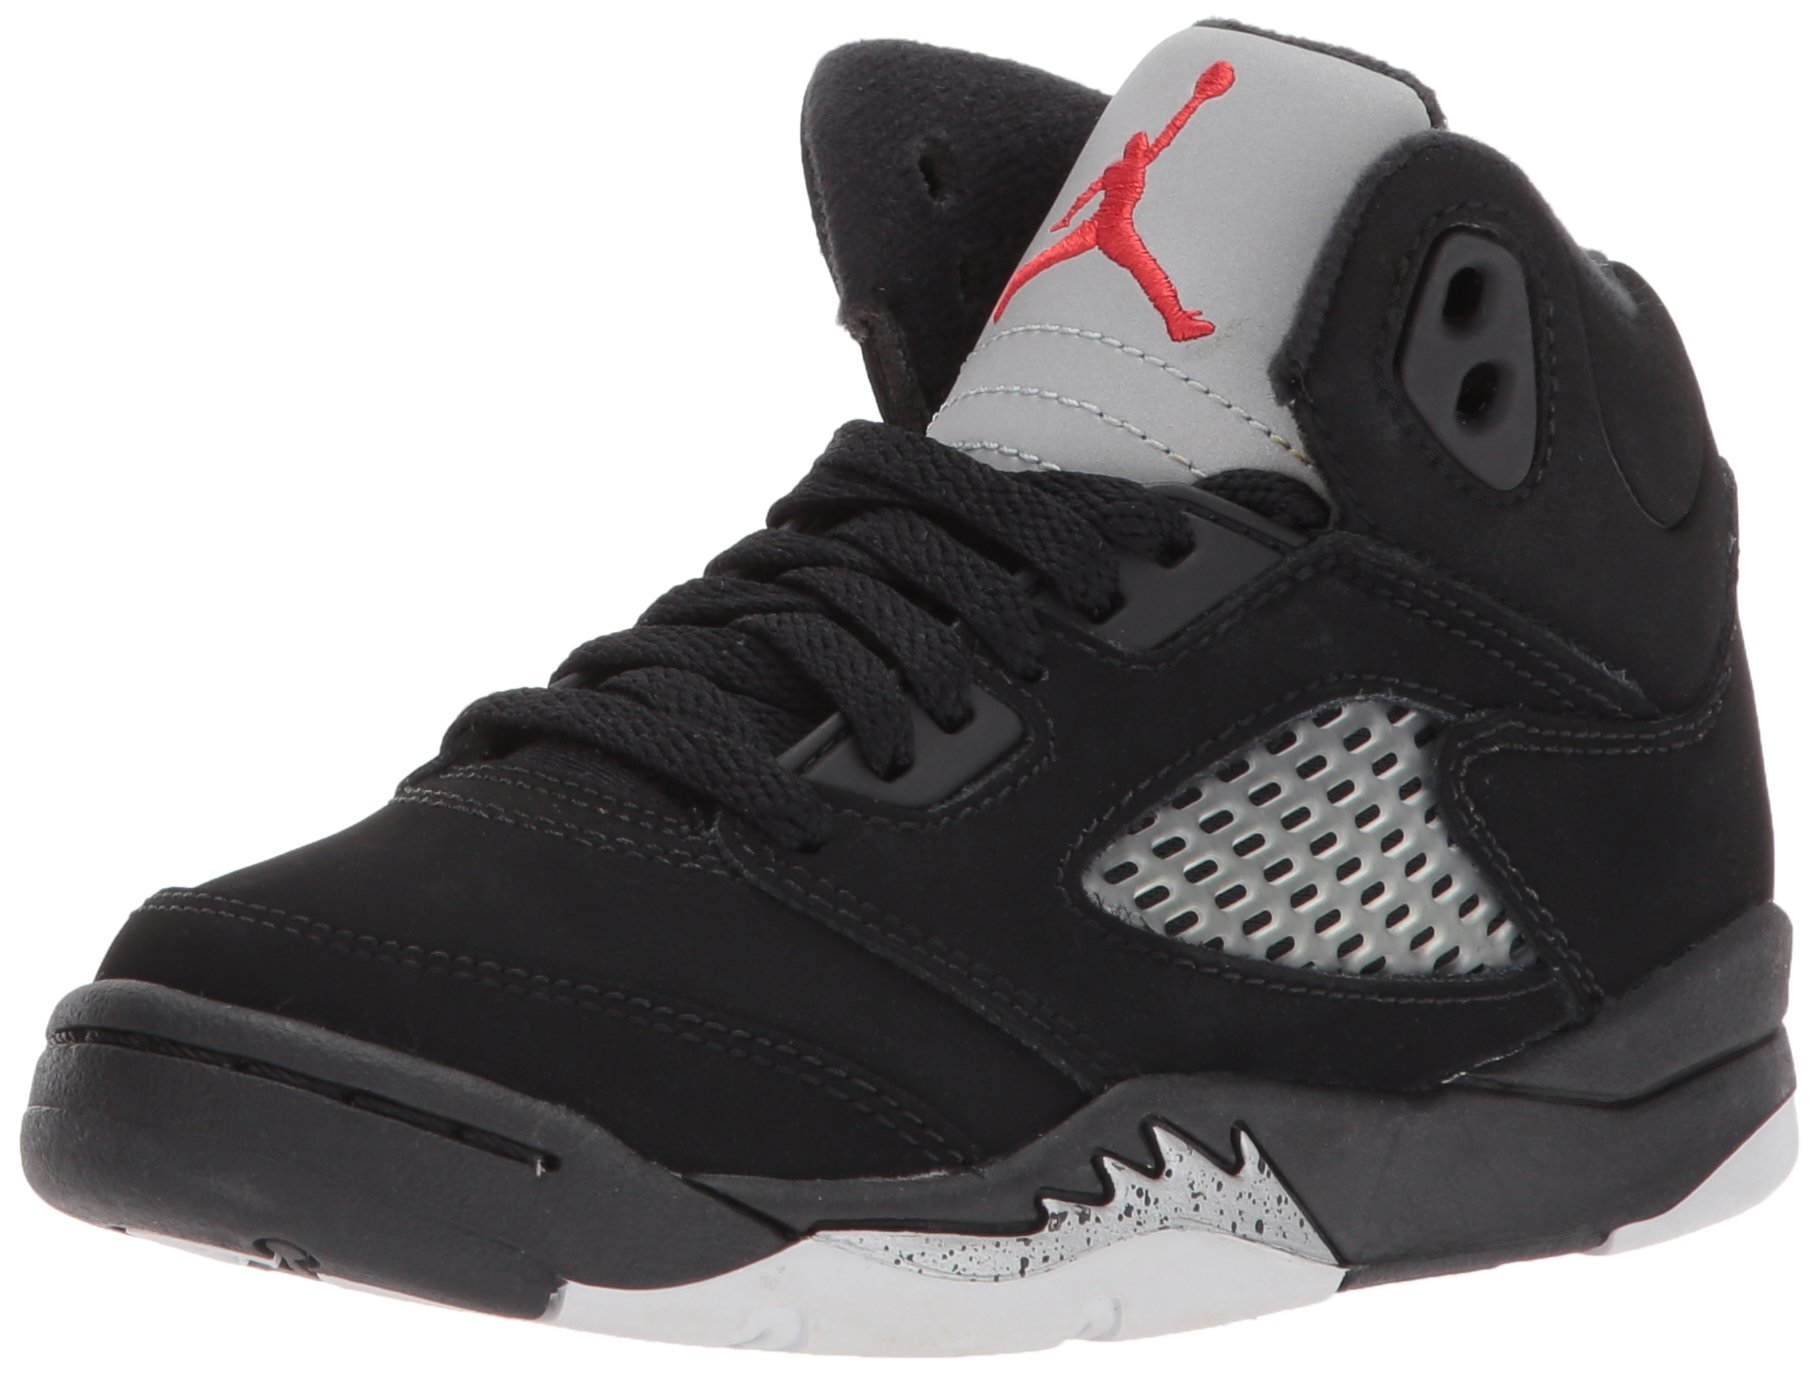 Air Jordan 5 Retro PS Black Metallic Silver Fire Red 440889-003 US 2y